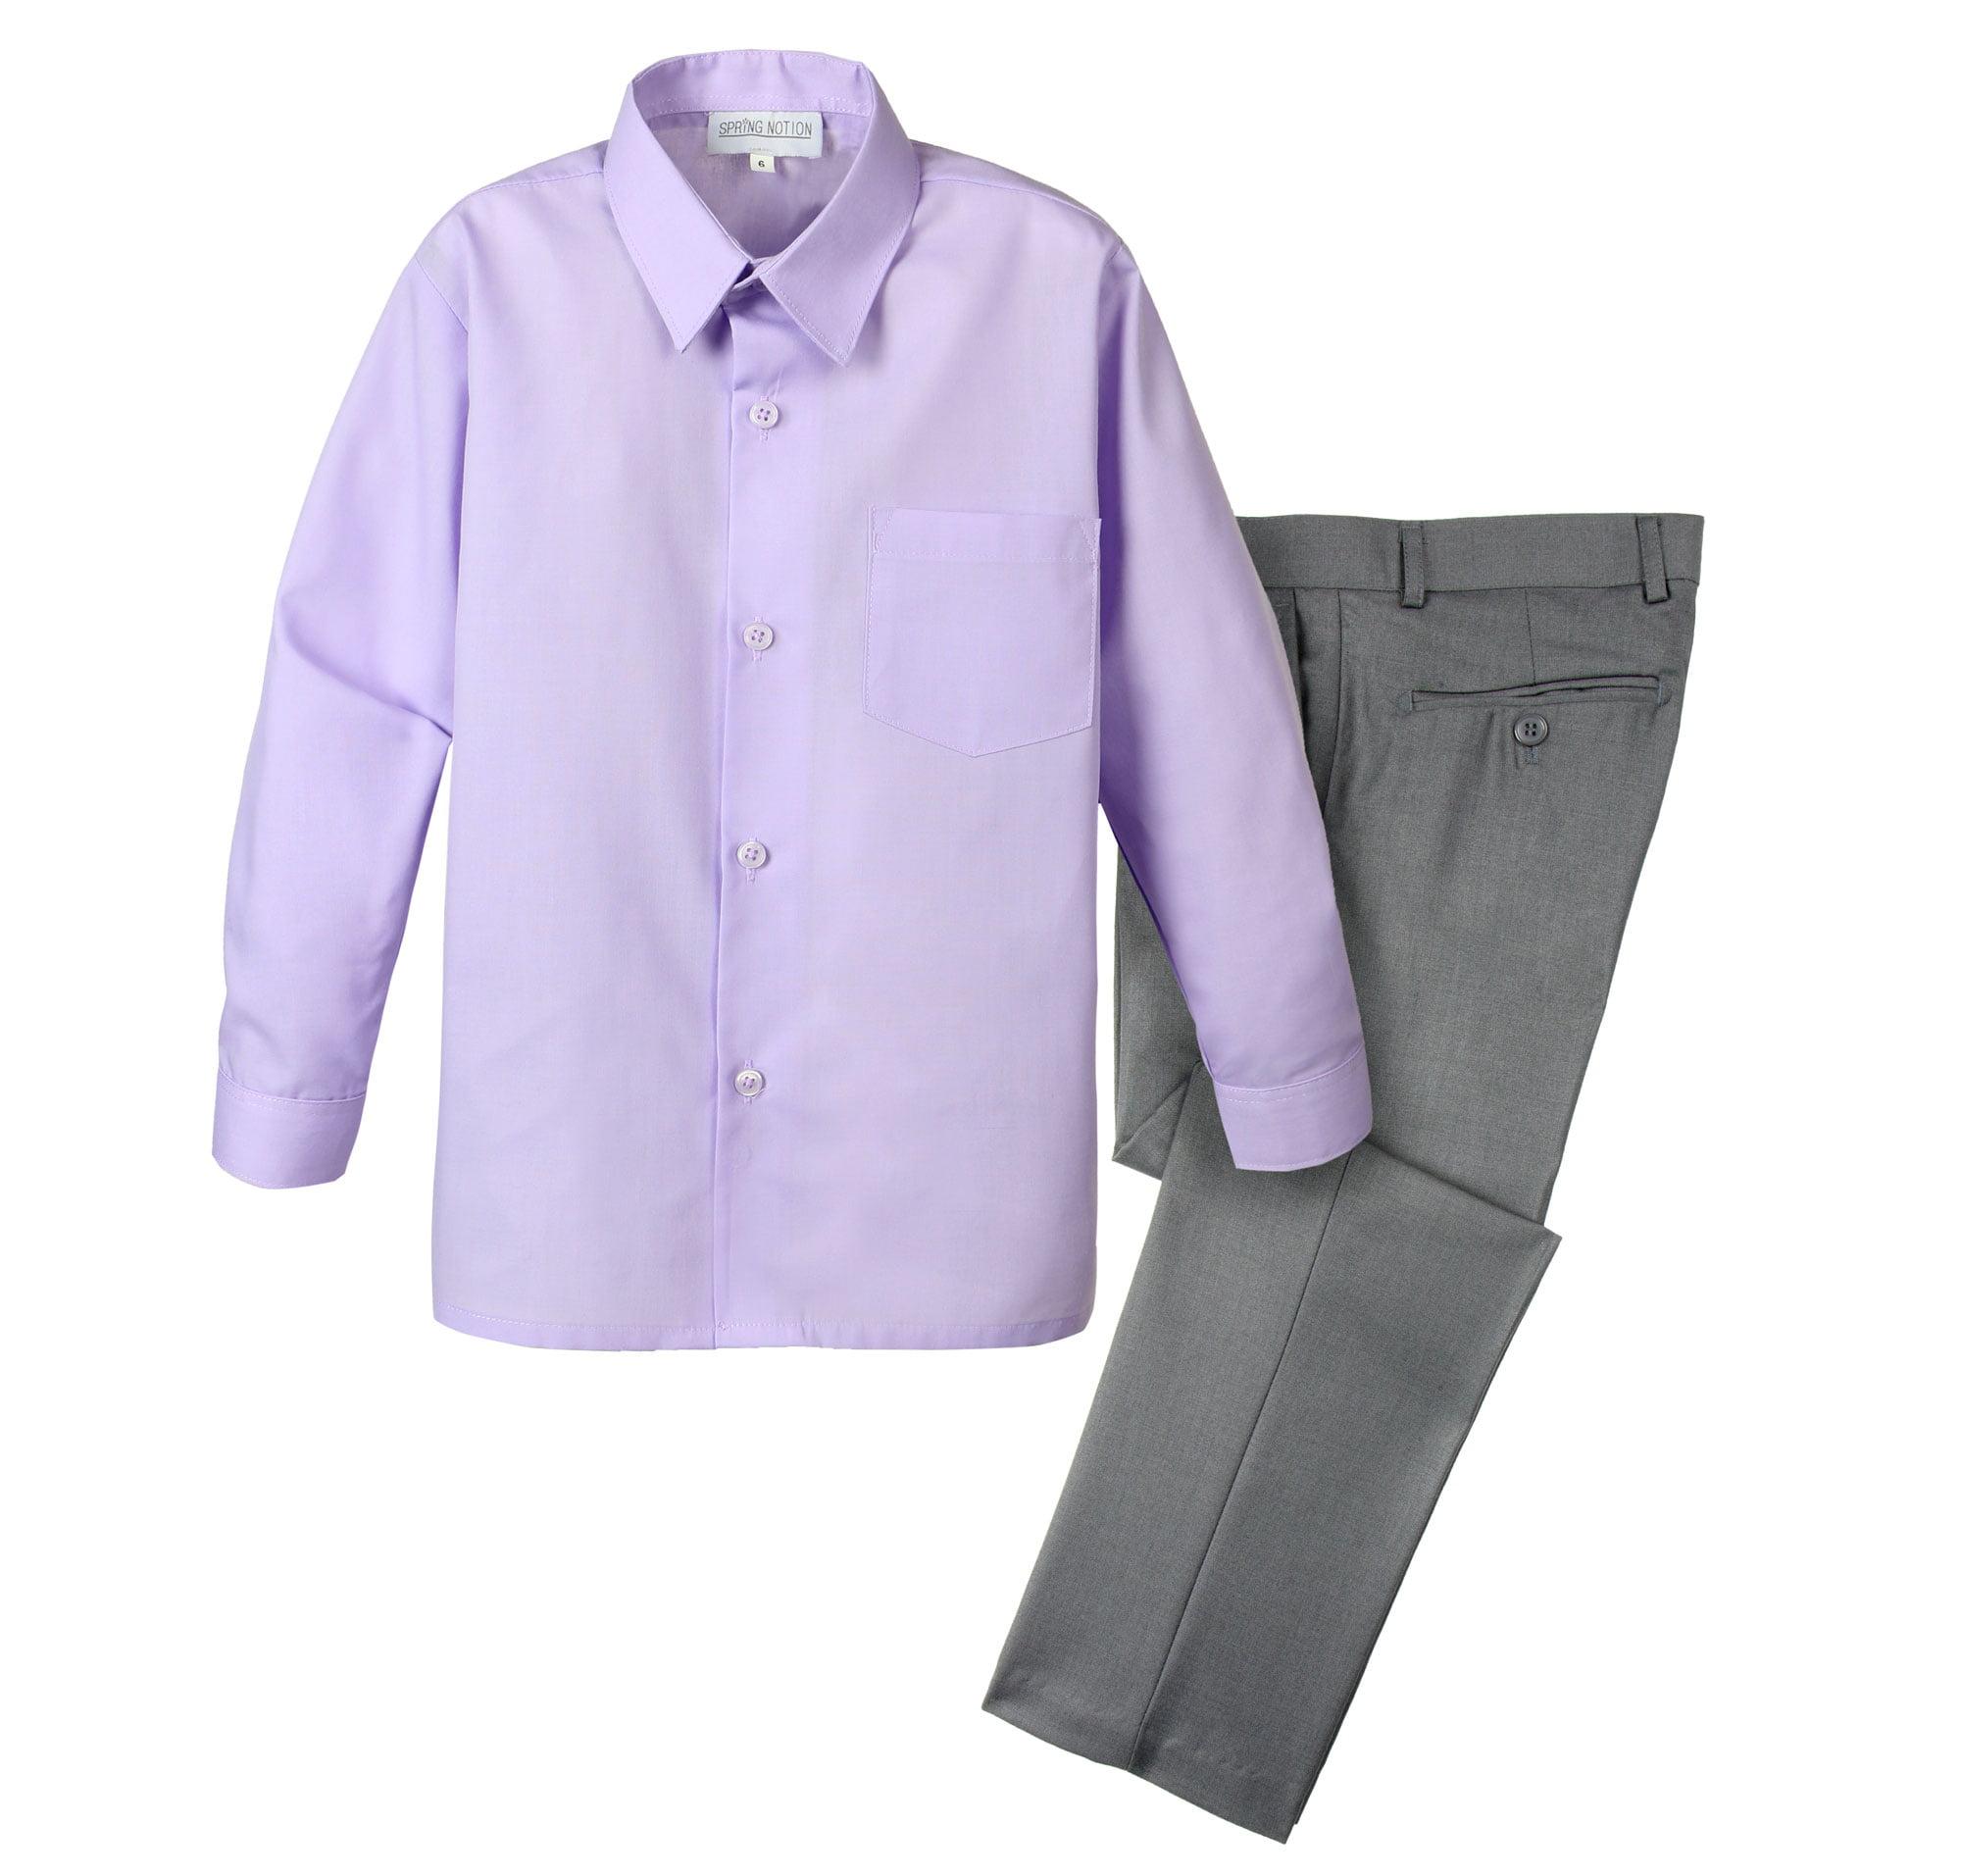 Spring Notion Spring Notion Boys Dress Pants And Shirt Walmart